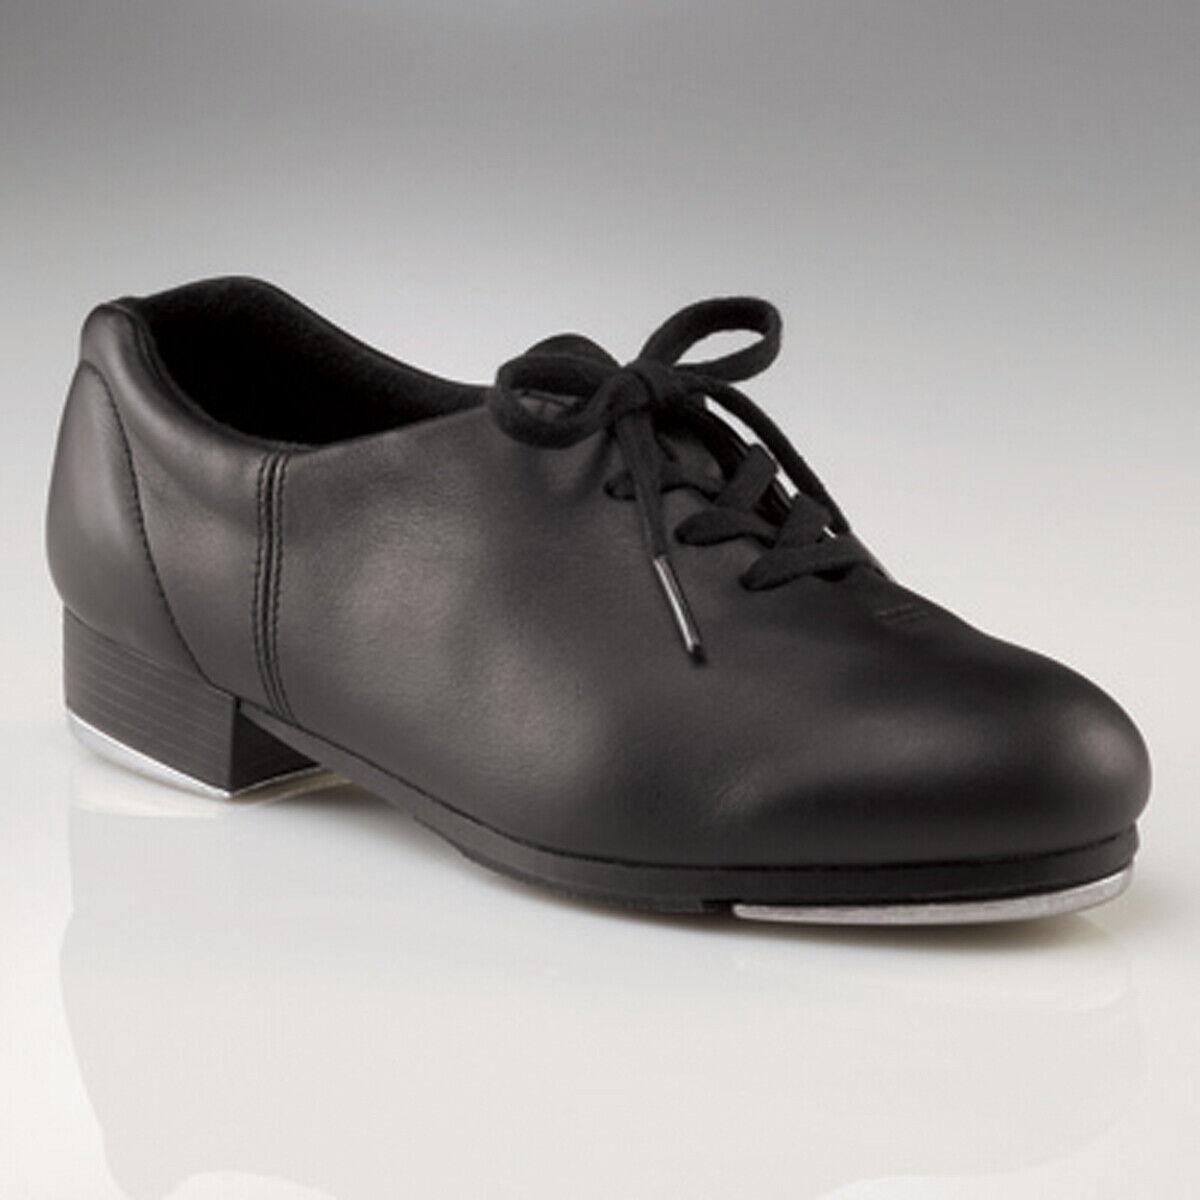 Capezio CG09 Tap Shoe Ladies 6 W Tan